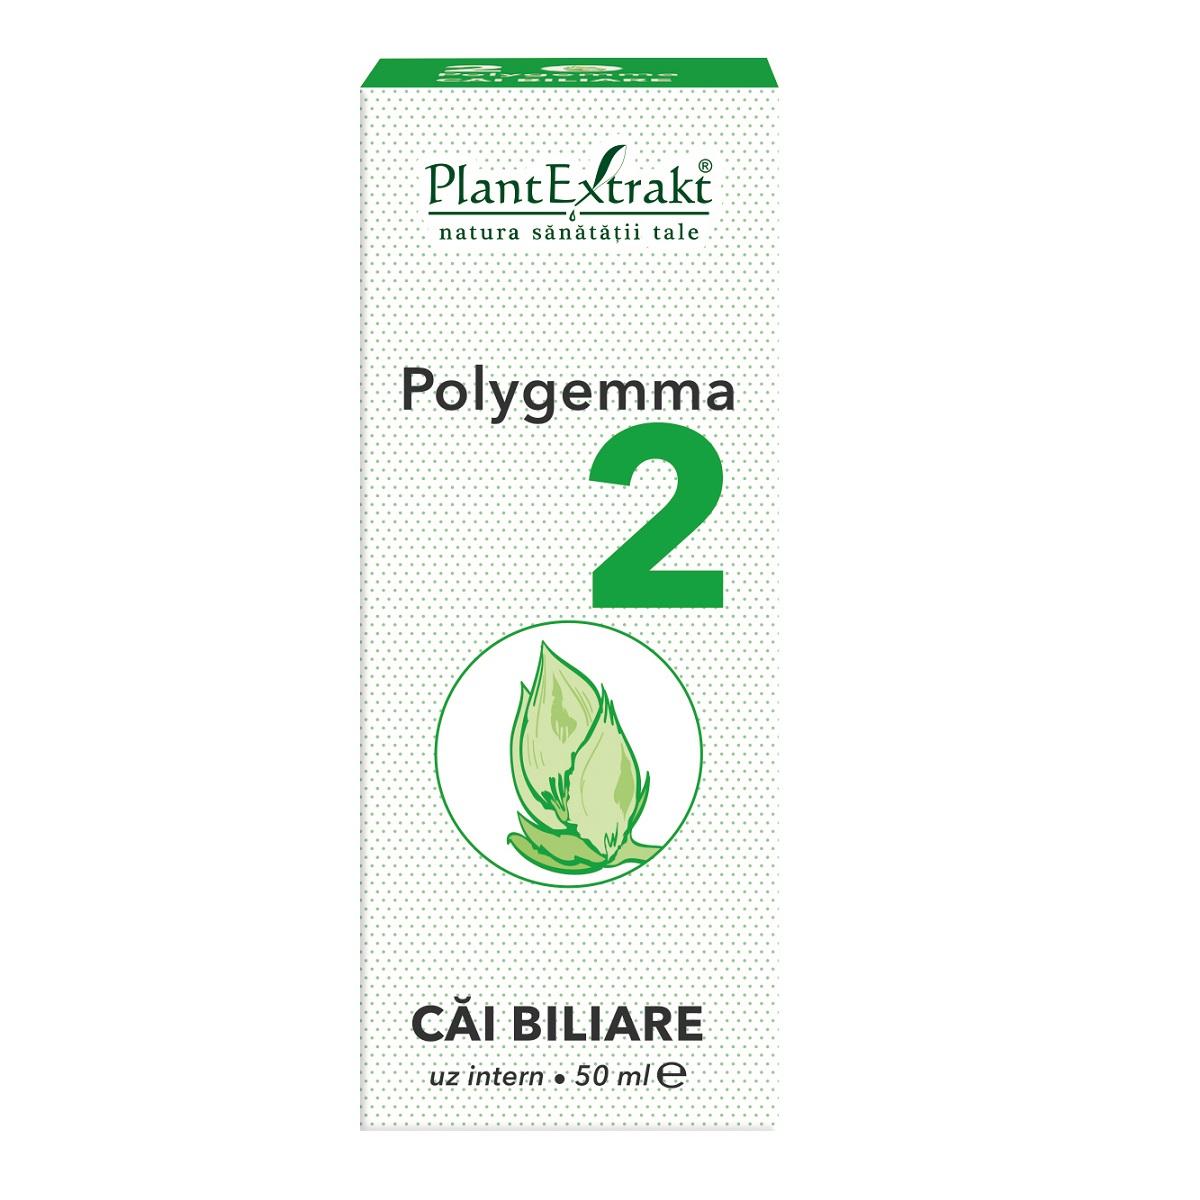 polygemma 11 farmacia tei